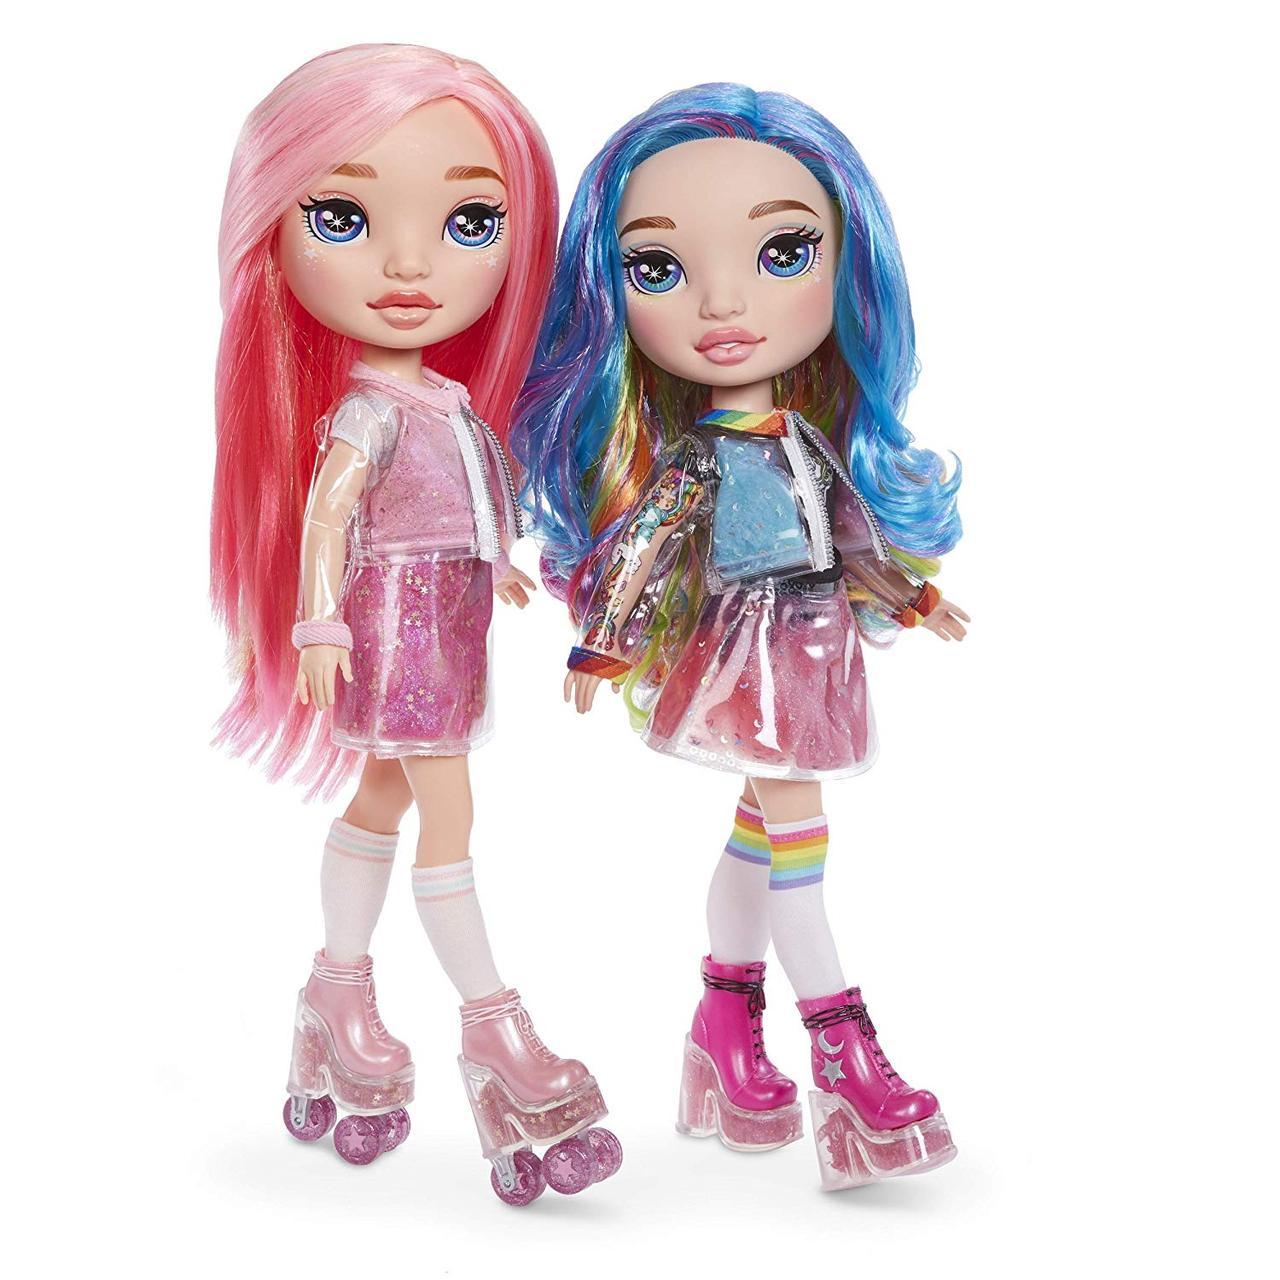 Кукла Пупси Радужная девочка Розовая или Радужная S1 Poopsie Rainbow Surprise Rainbow Dream Pixie Rose